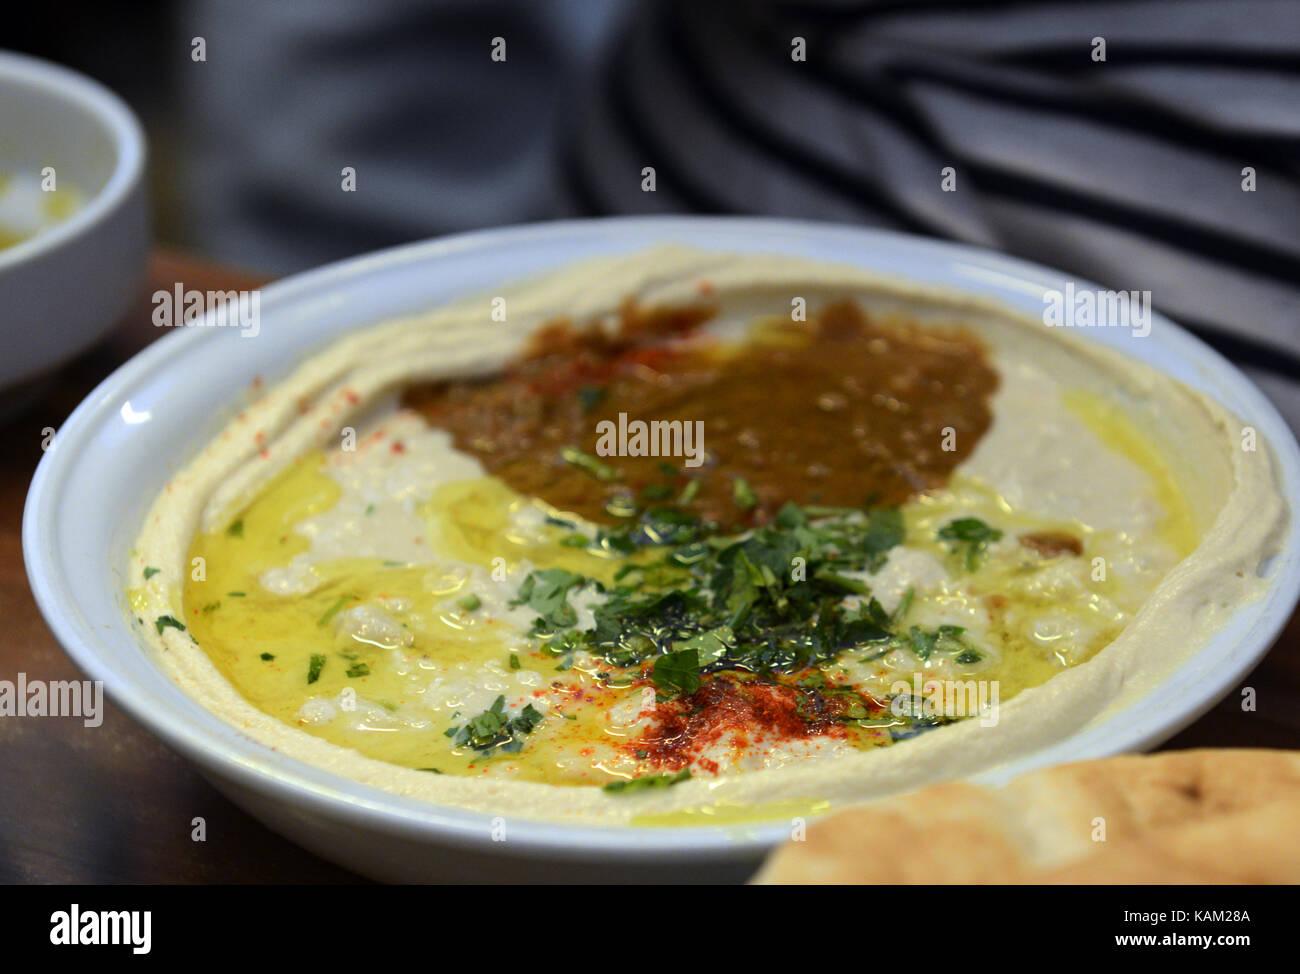 A plate of Hummus, Fuul and Masabacha at Abu Hasan / Ali Karavan restaurant in Jaffa. - Stock Image